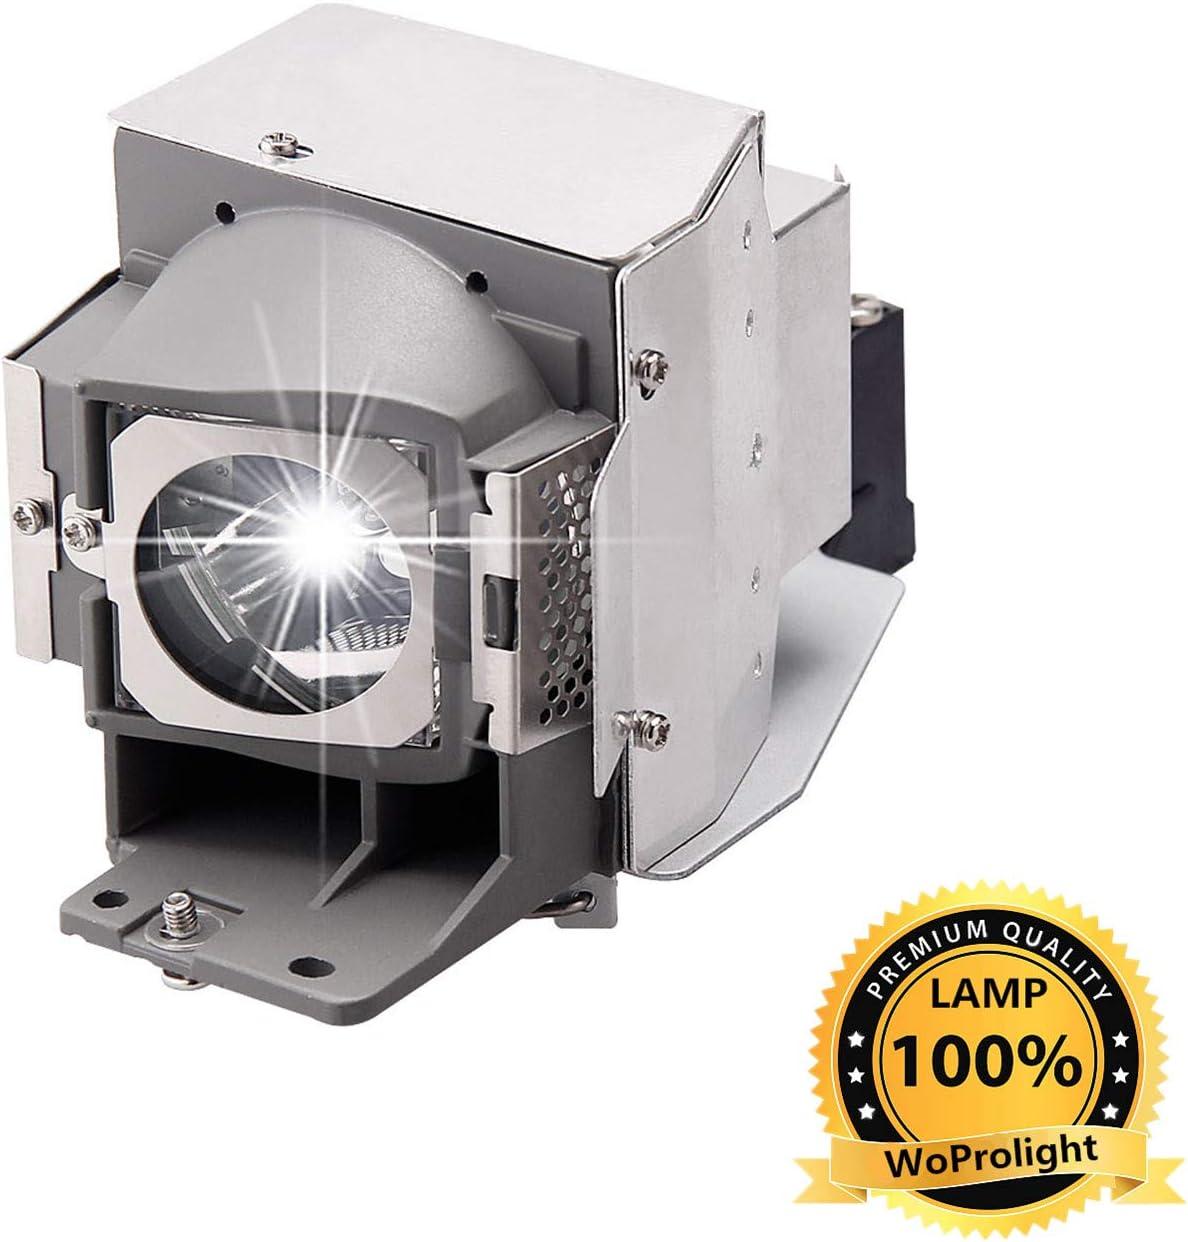 5J.J9H05.001 Projector Lamp Bulb for Benq W1070 W1080ST HT1075 HT1070A HT1085ST W1070+,Original Lamp with Housing WoProlight 5J.J7L05.001